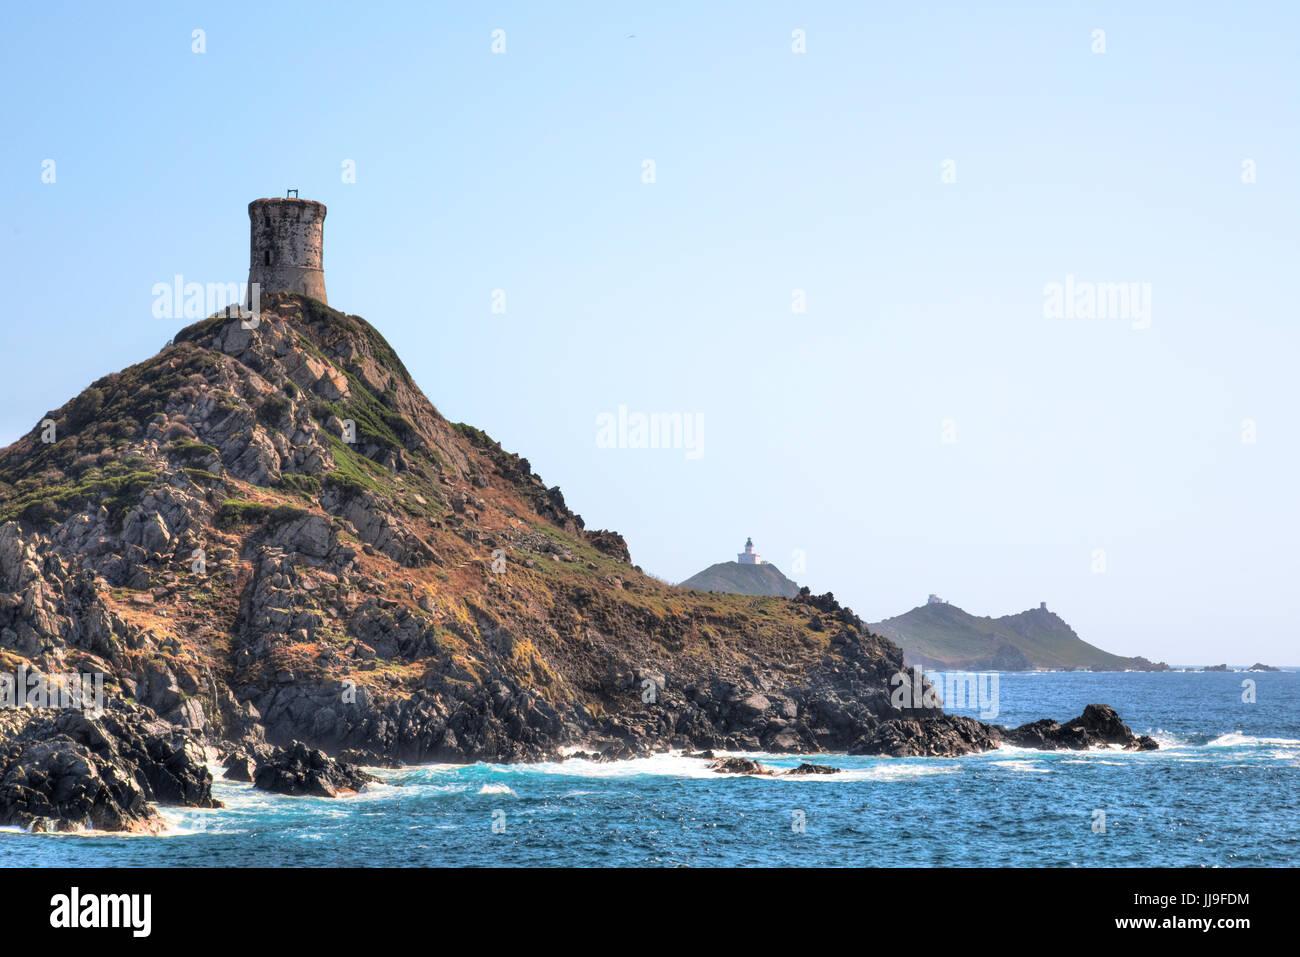 Pointe de la Parata, Sanguinaires, Ajaccio, Corse, France Photo Stock